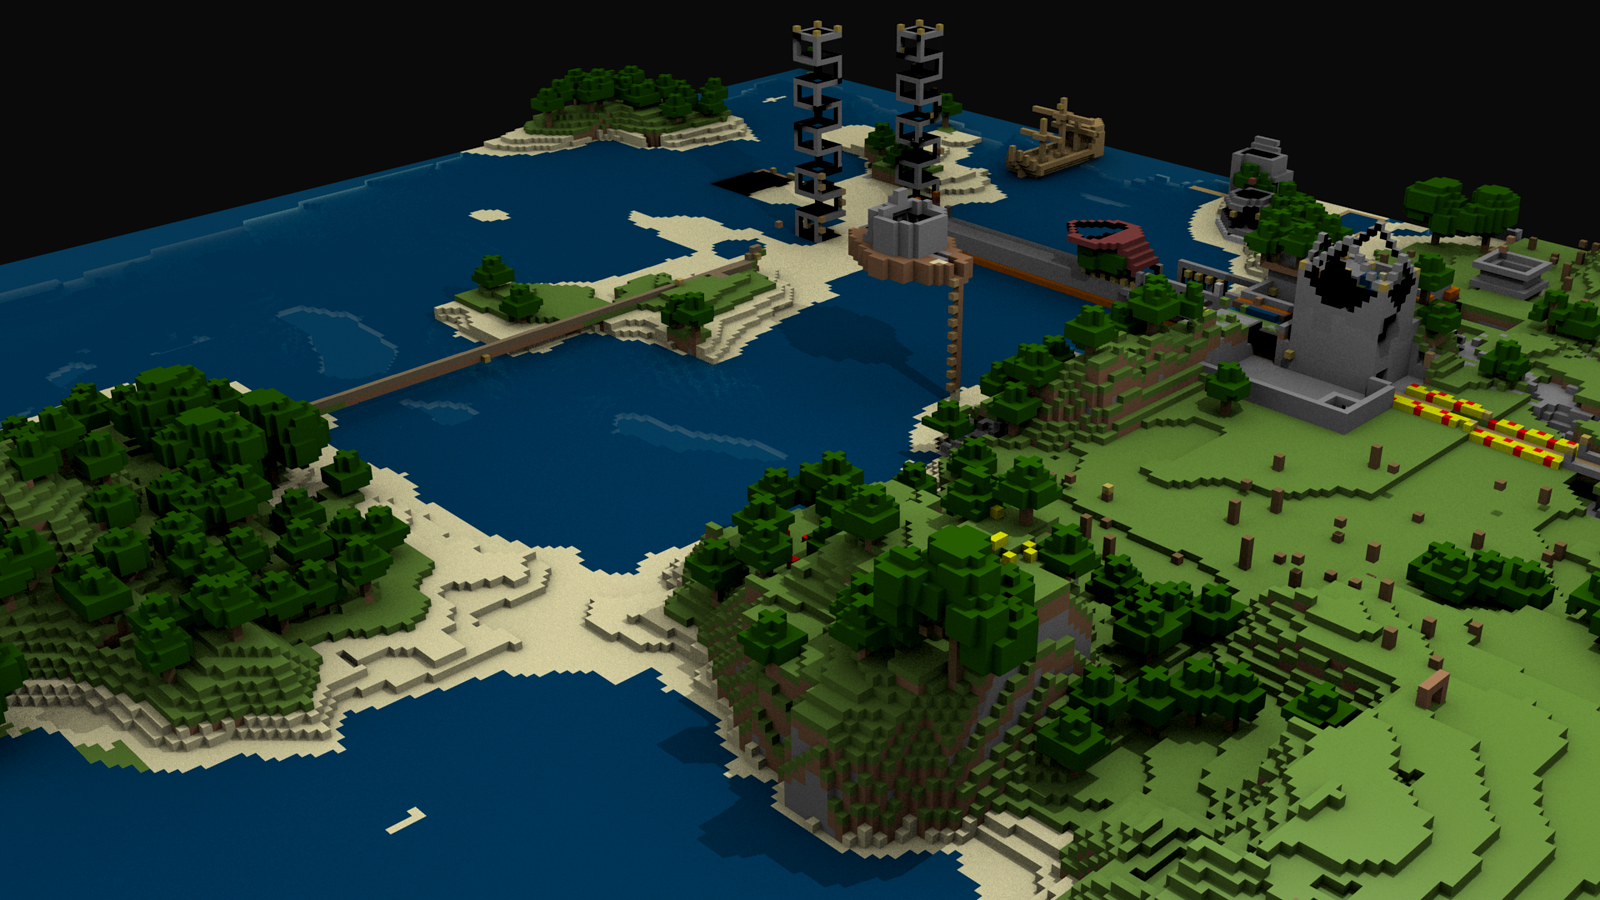 Amazing Wallpaper Minecraft Computer - c3c013f4da3391d0ad47e381210384fc  Snapshot_401097.png